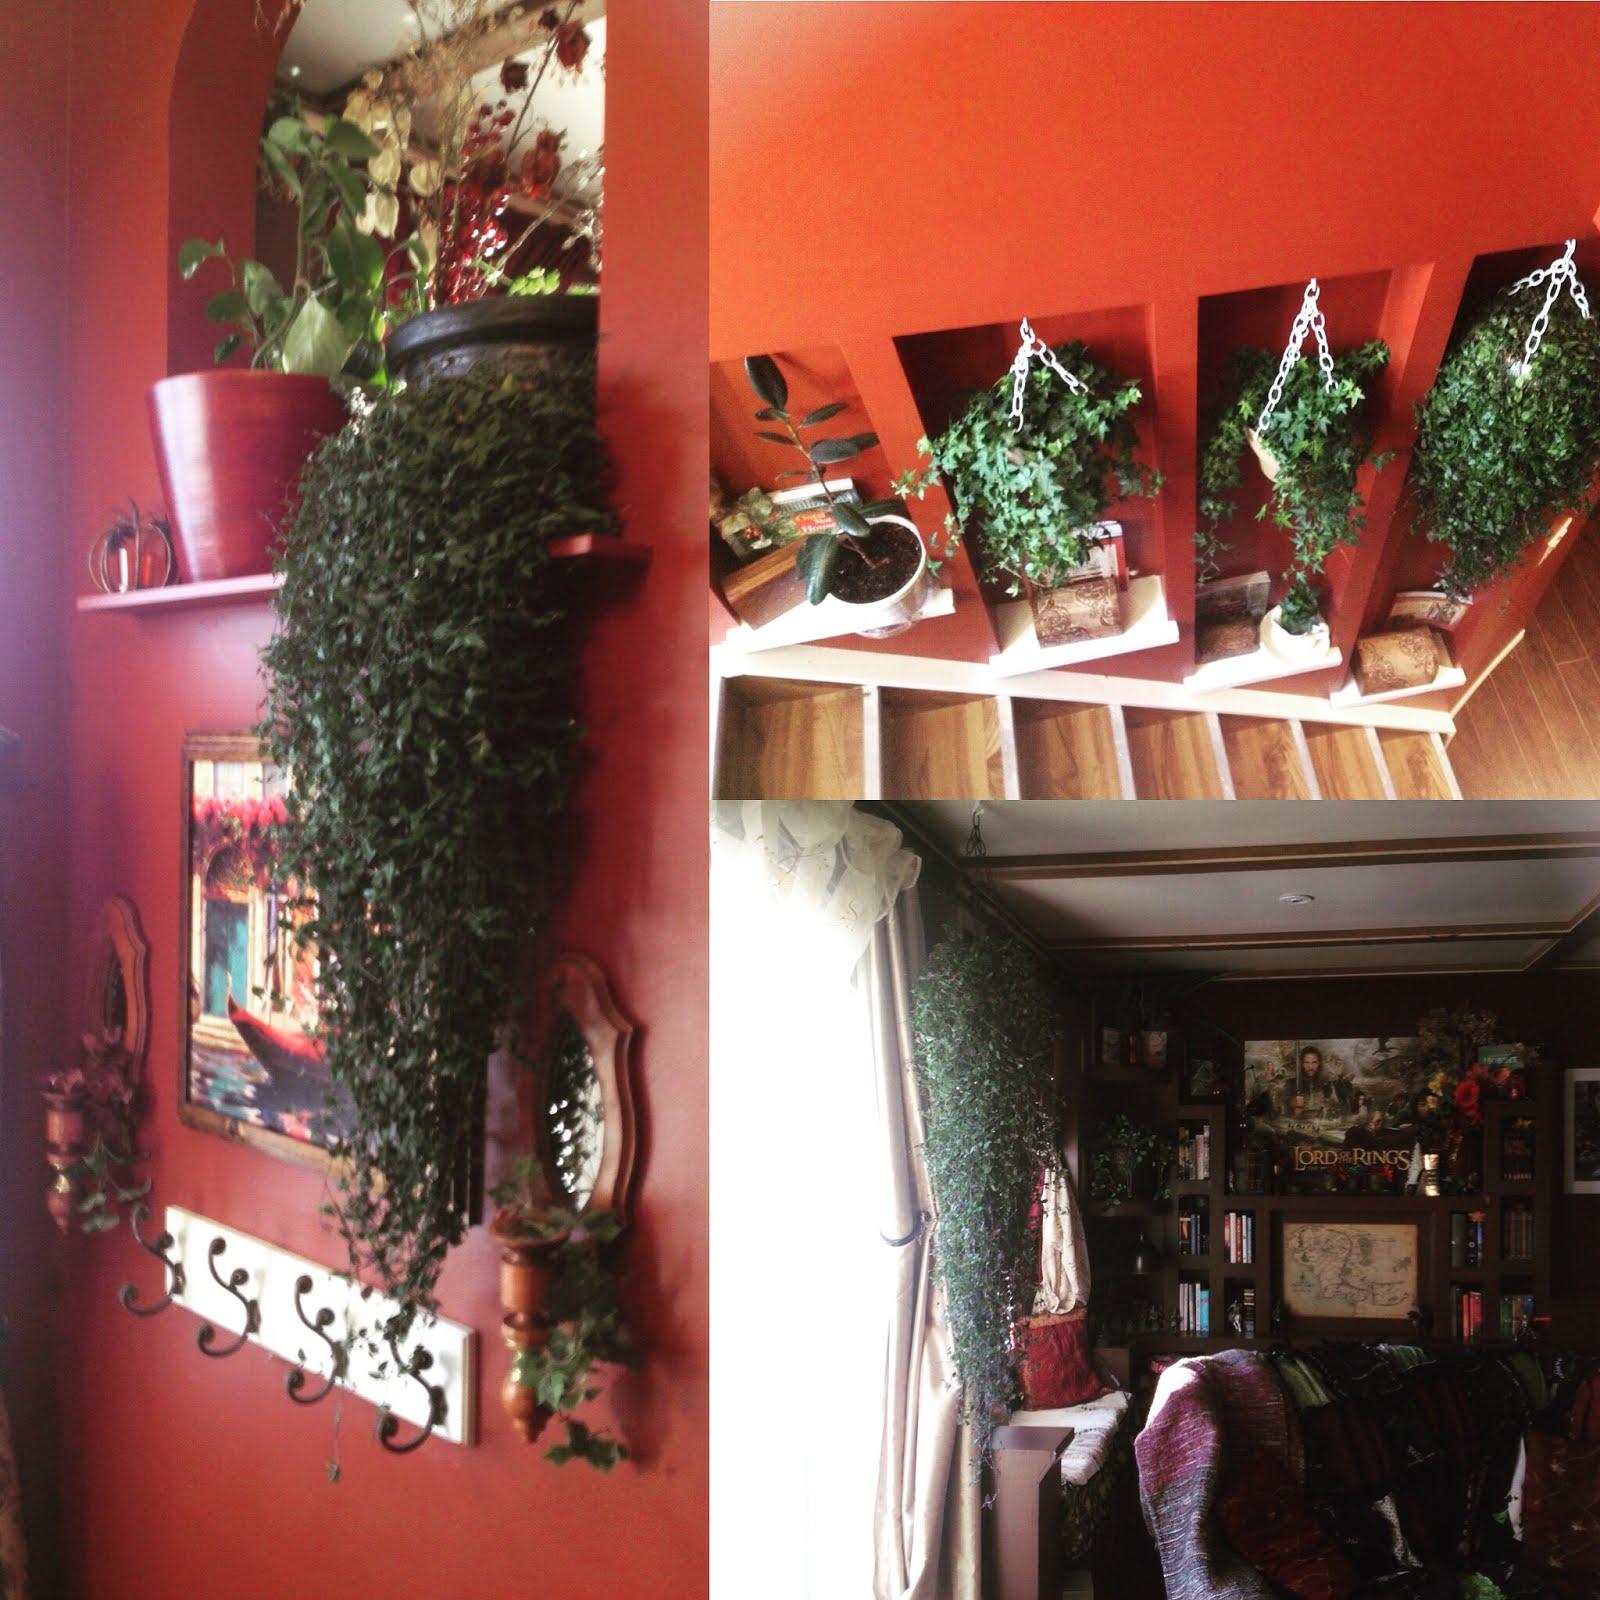 My Plants.